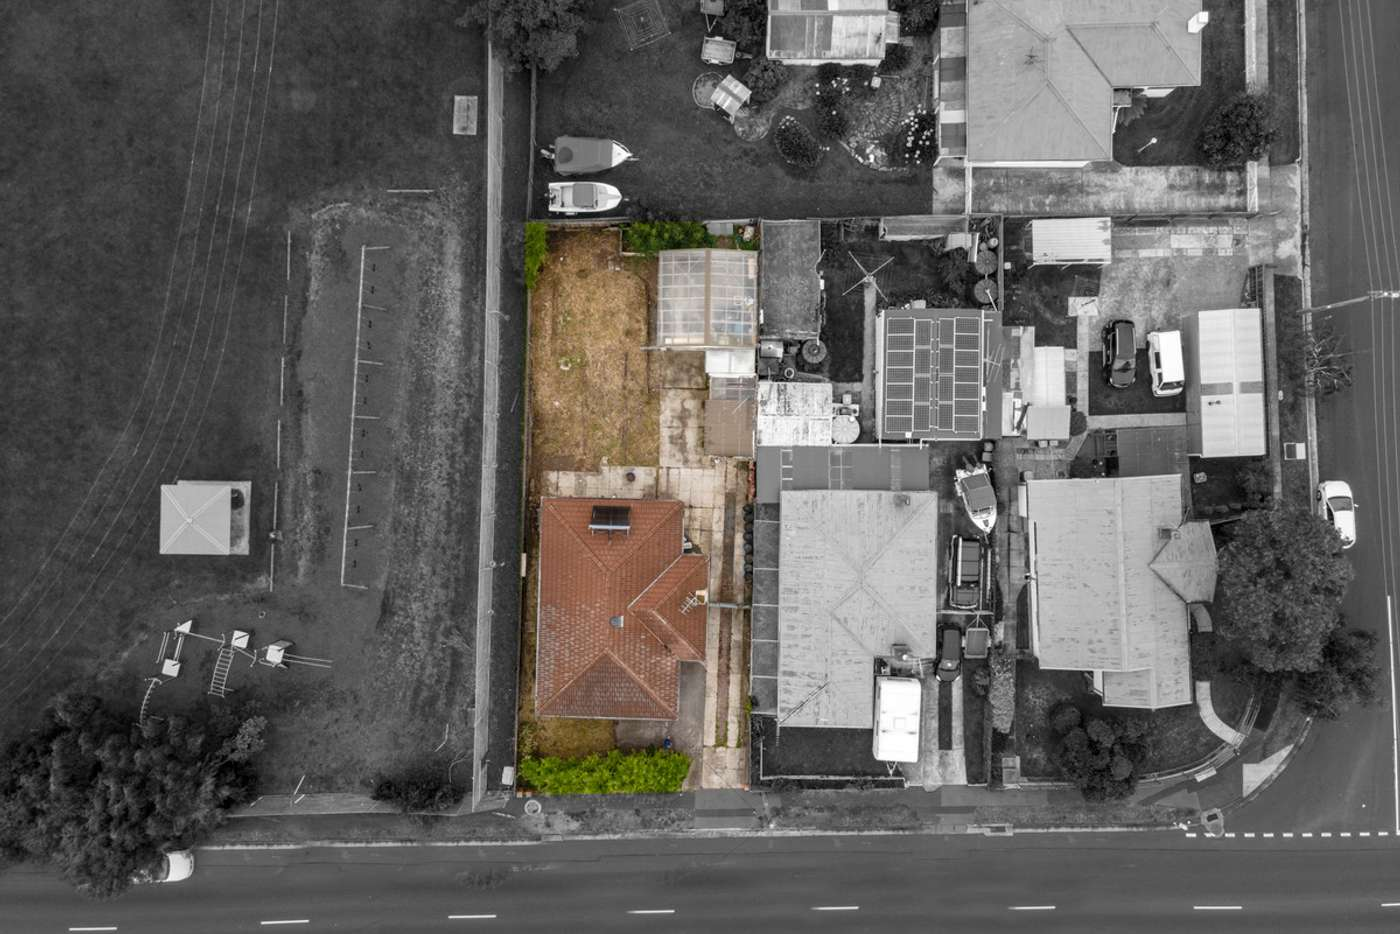 Main view of Homely house listing, 134 Albert Road, Moonah TAS 7009